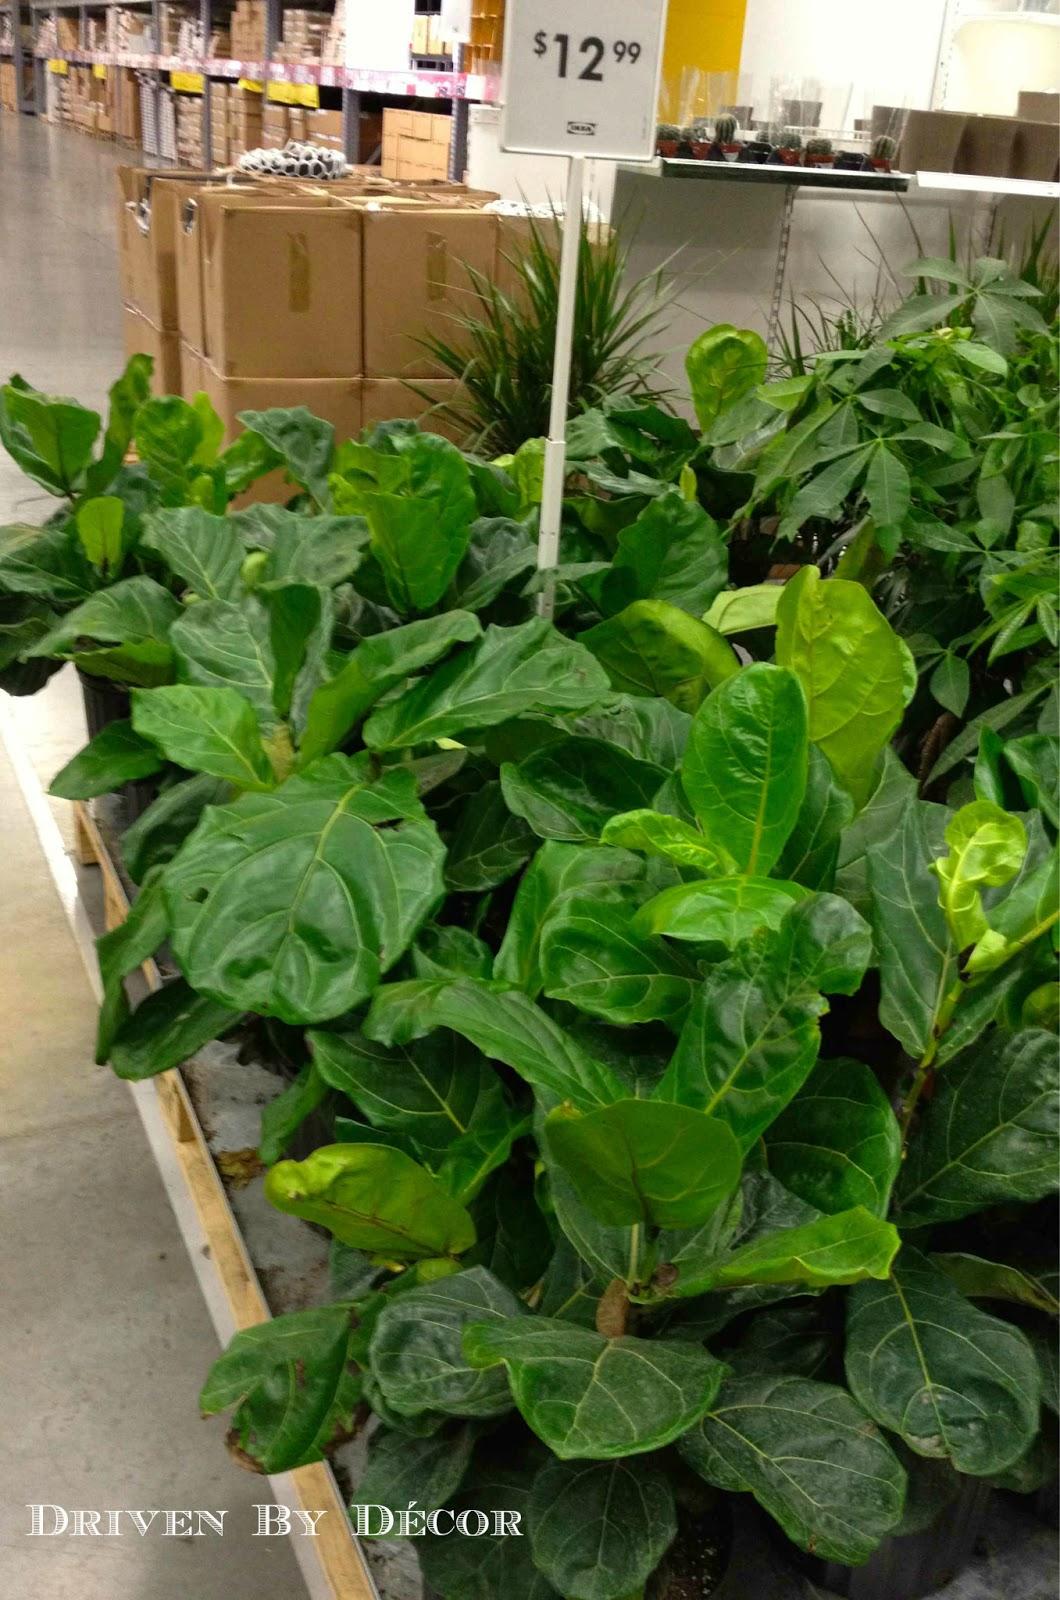 ikea's new indoor plants | drivendecor